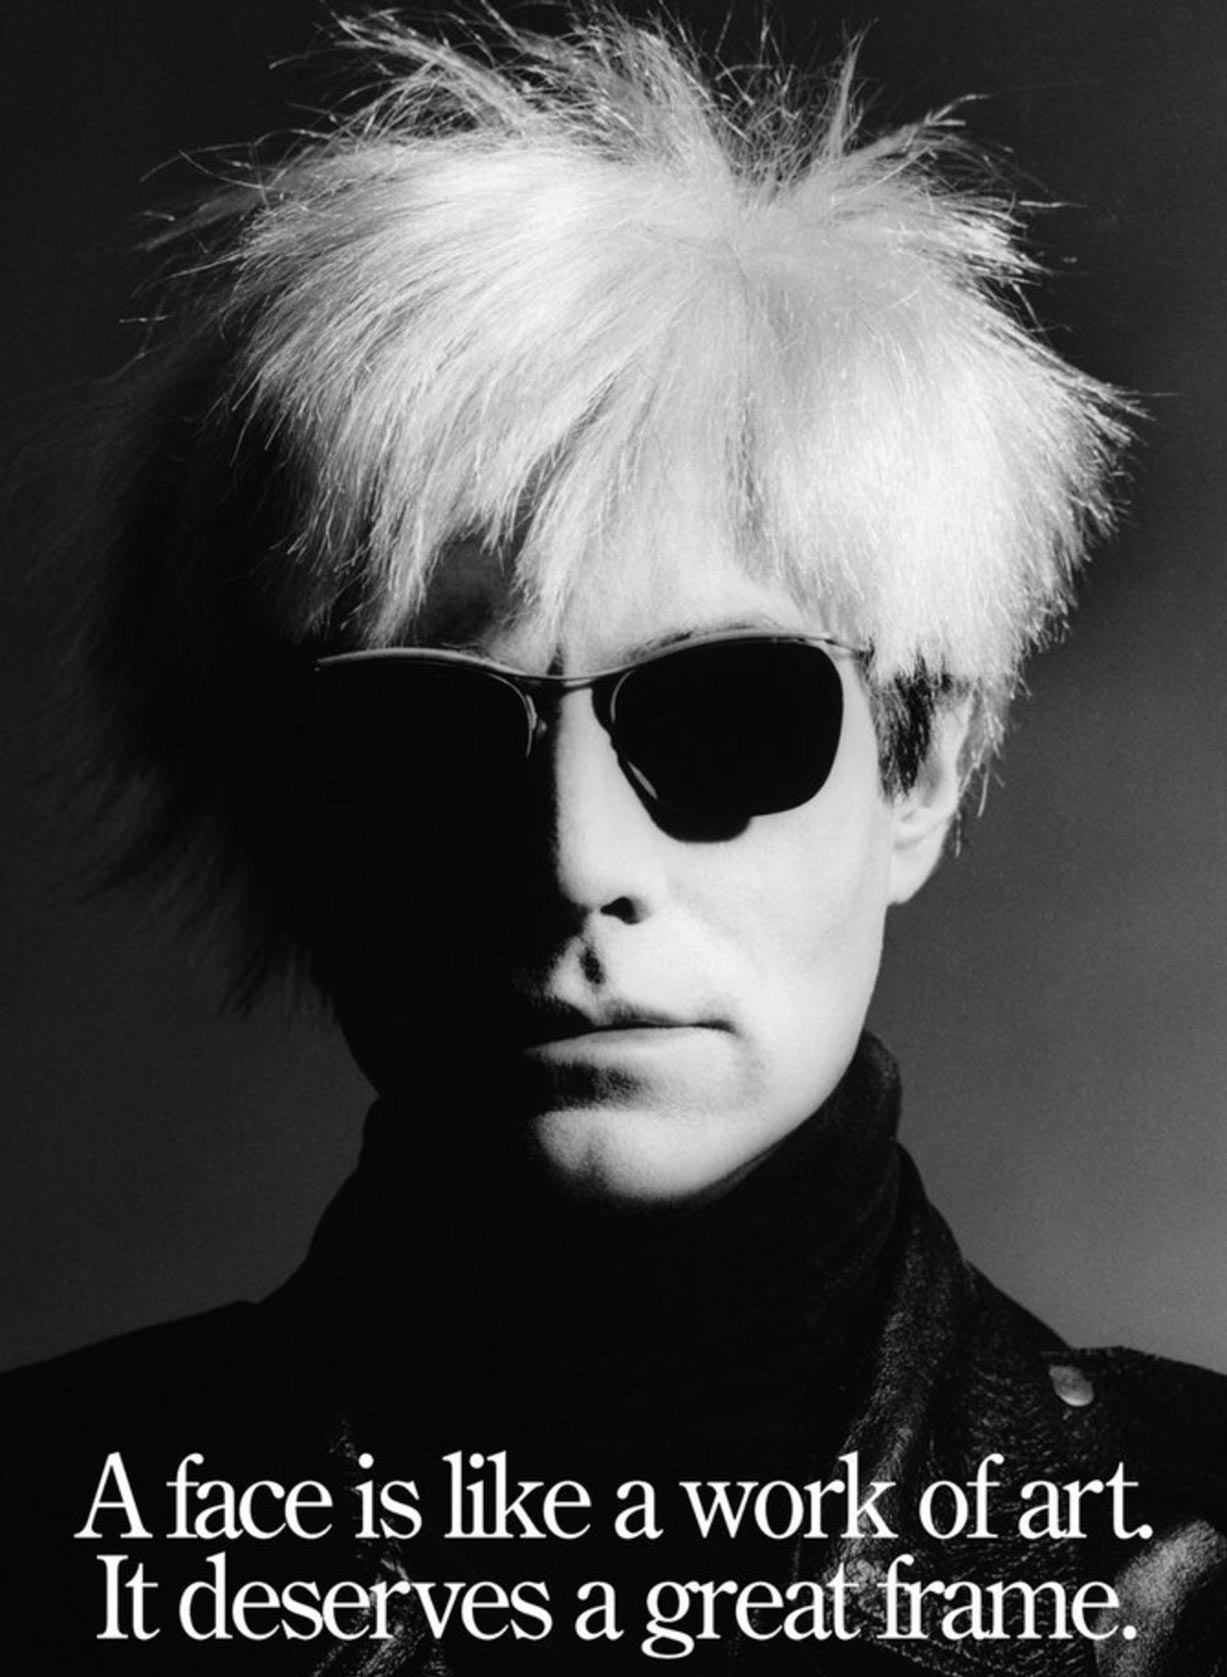 Andy Warhol / Энди Уорхол - портрет фотографа Грега Гормана / Greg Gorman